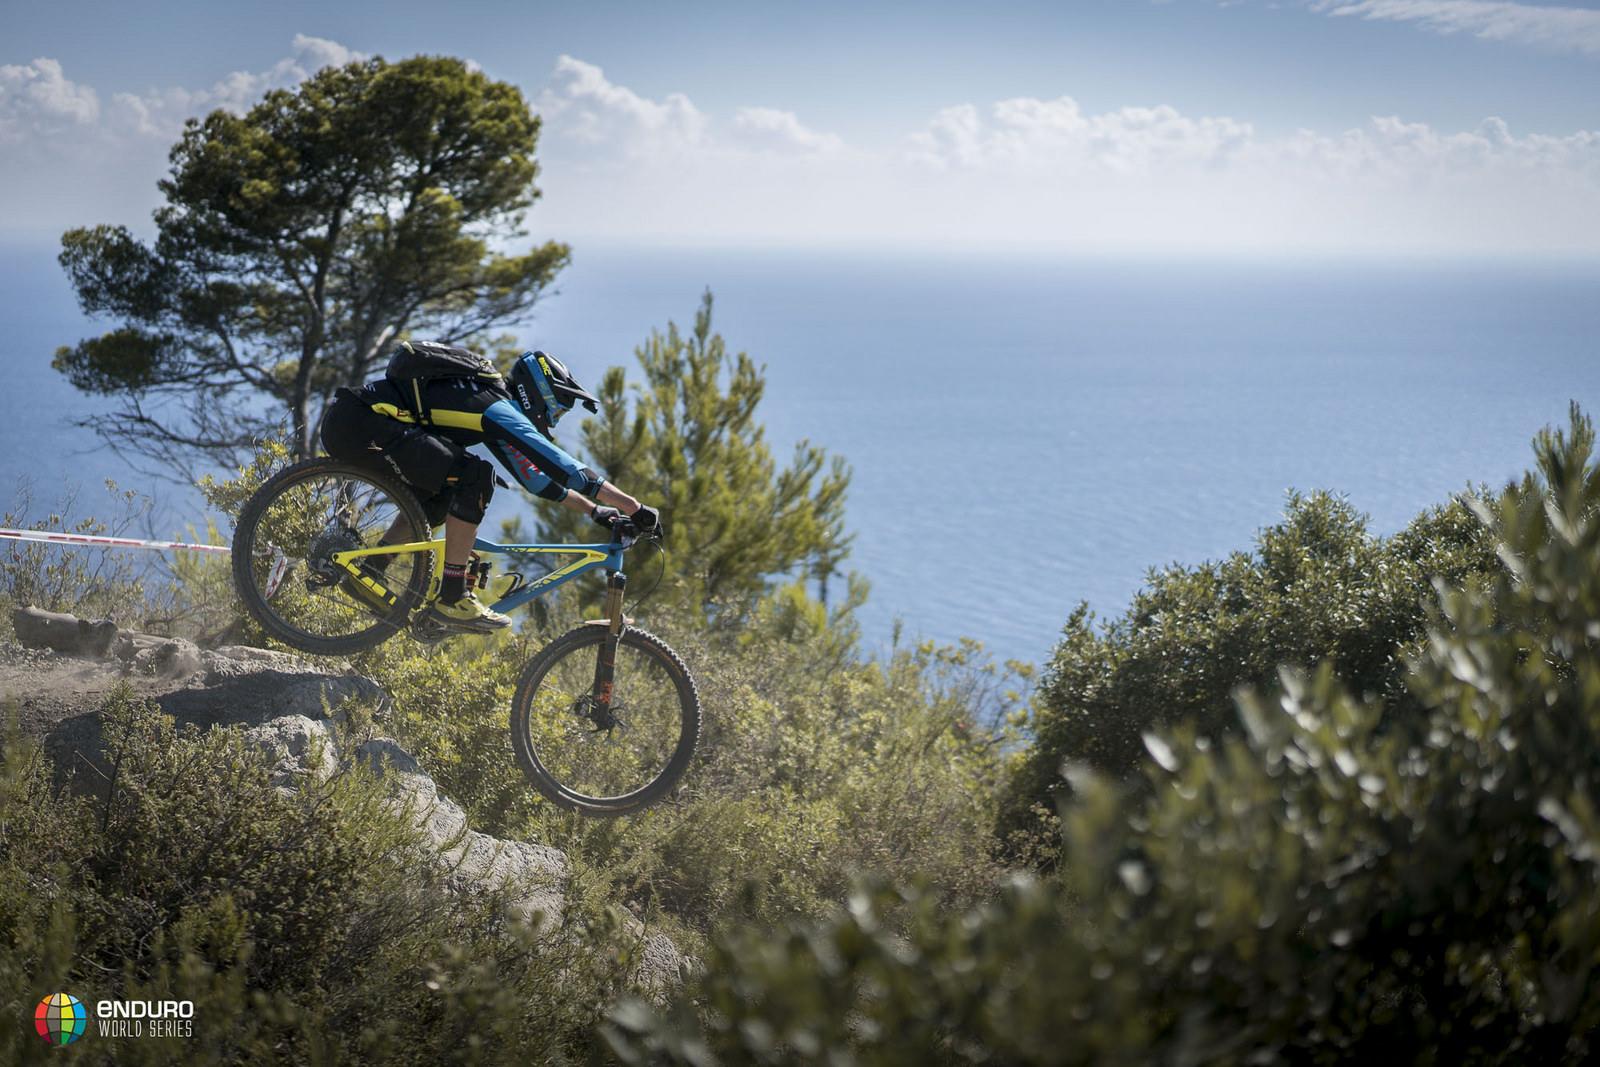 Mountain-bike-Finale-Ligure-1